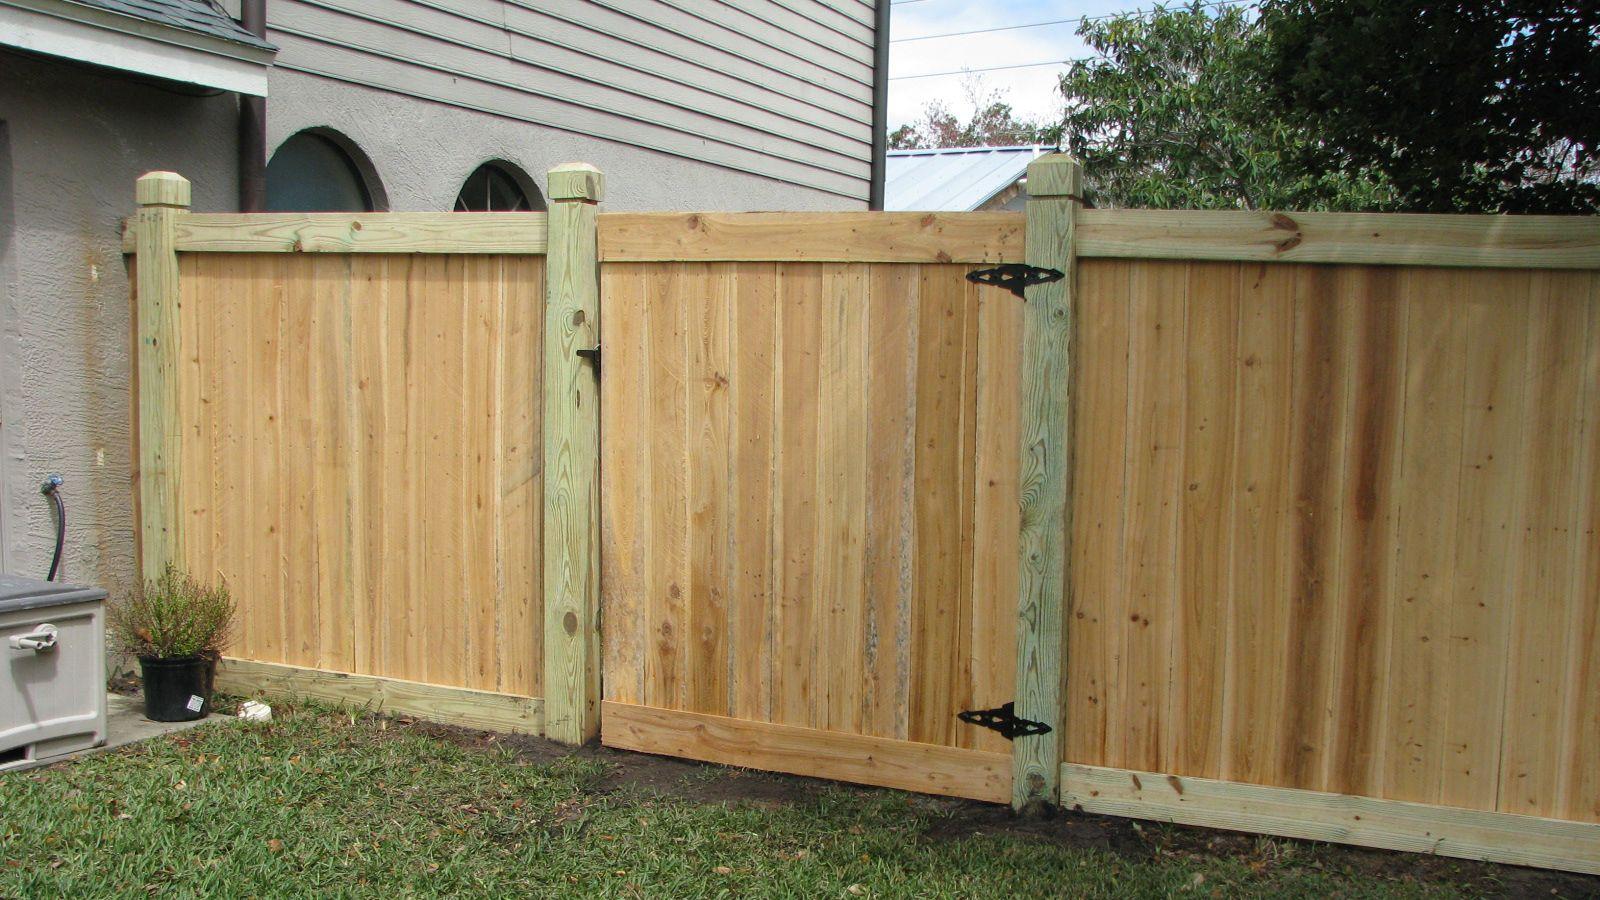 13.SIMPHOME.COM mossy oak fence wood fence designs wood privacy fence wood